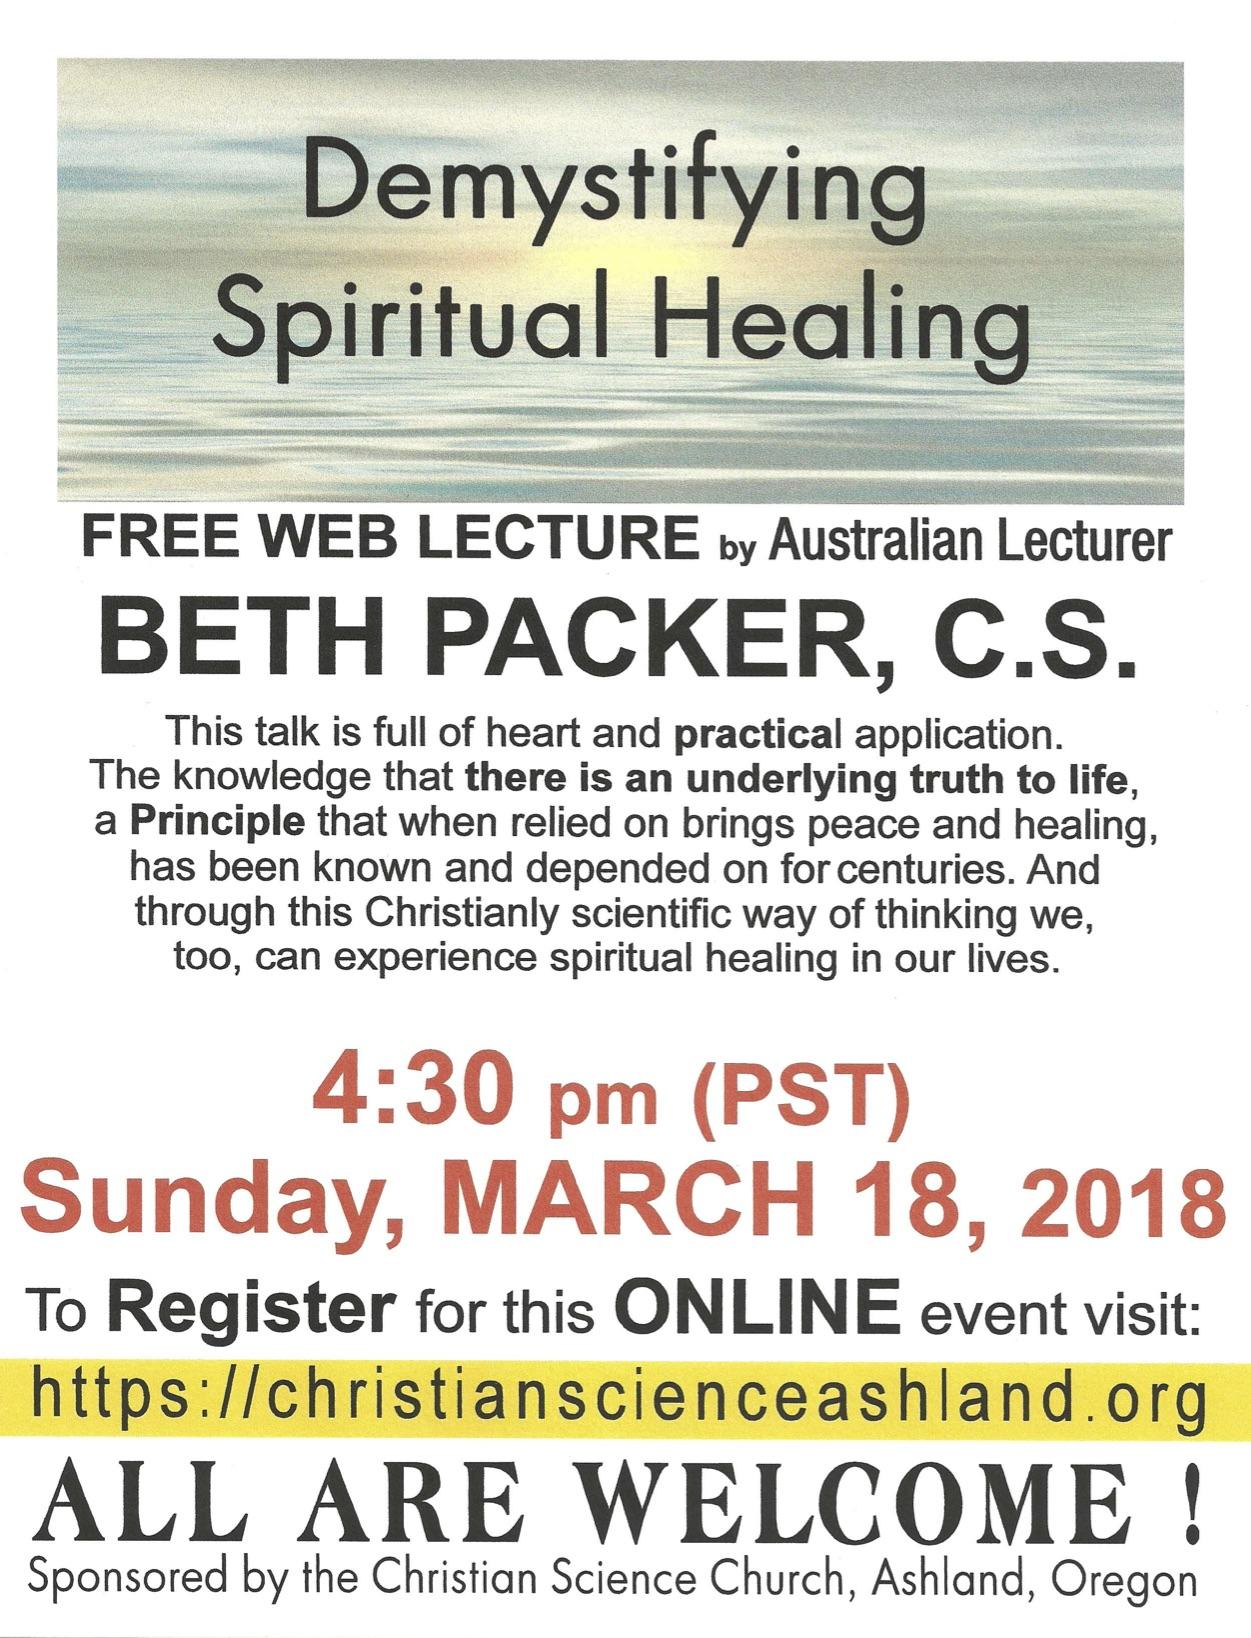 Demystifying Spiritual Healing